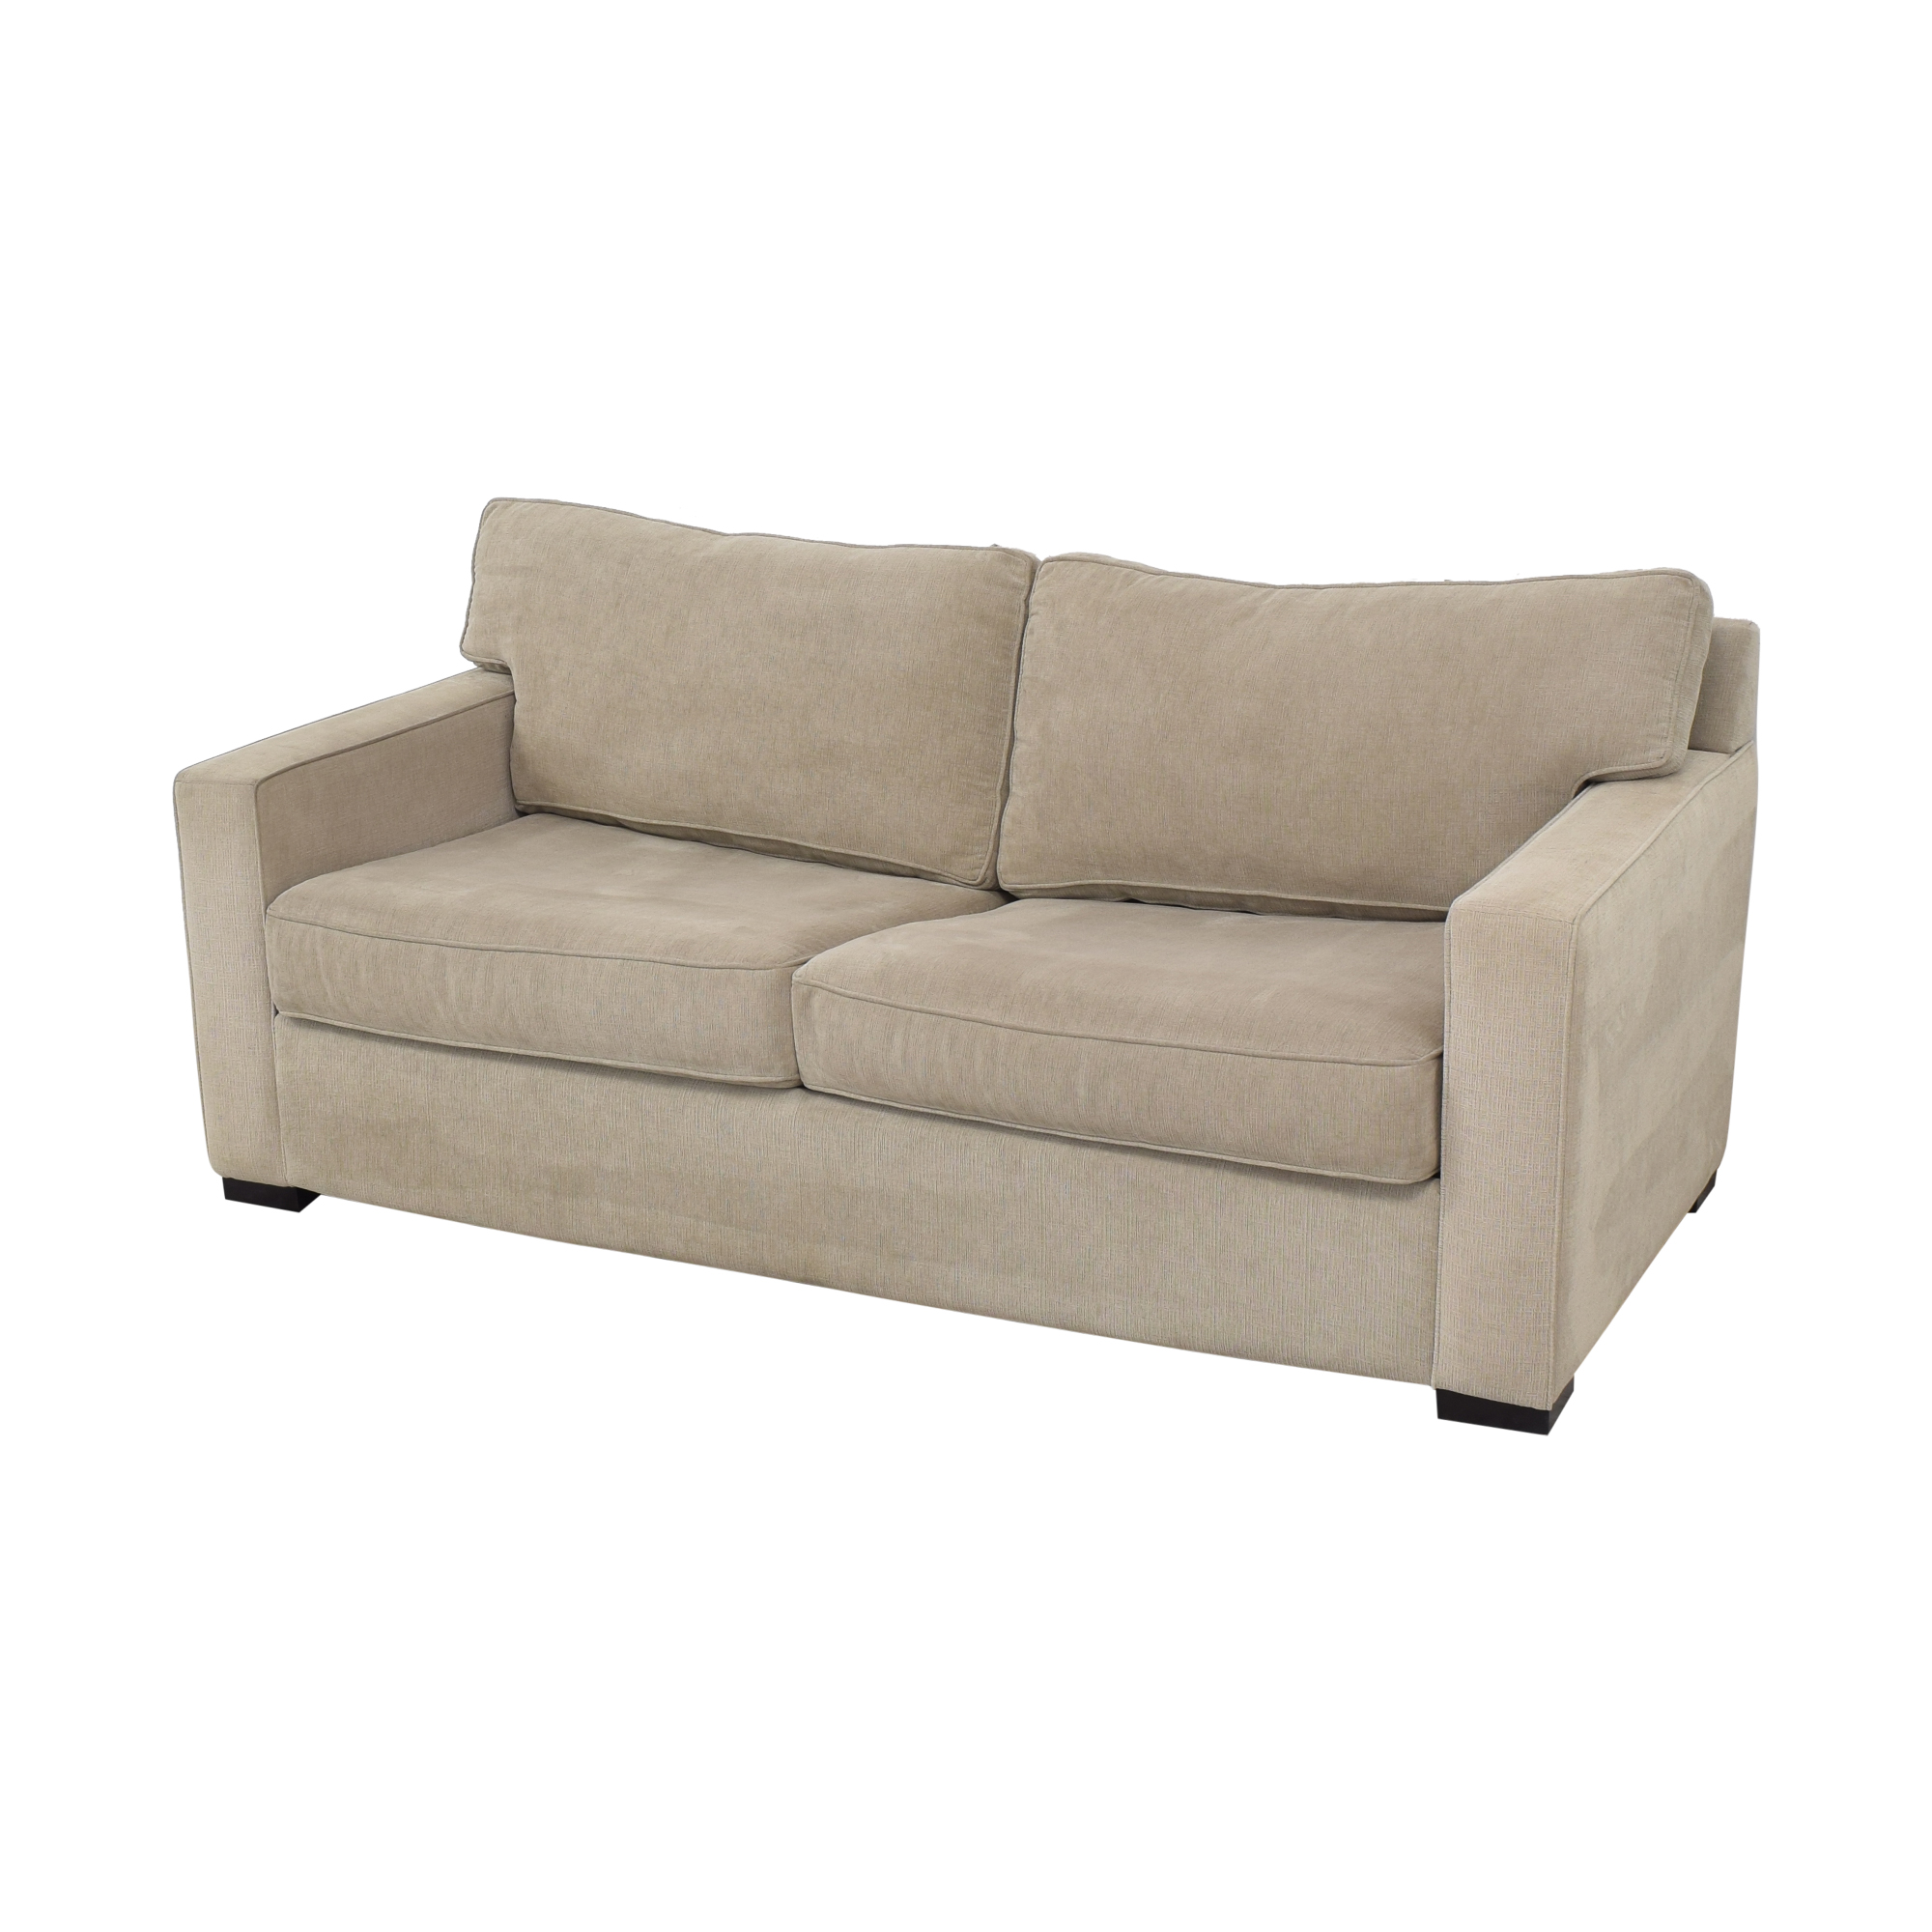 Macy's Macy's Two Cushion Sleeper Sofa ct